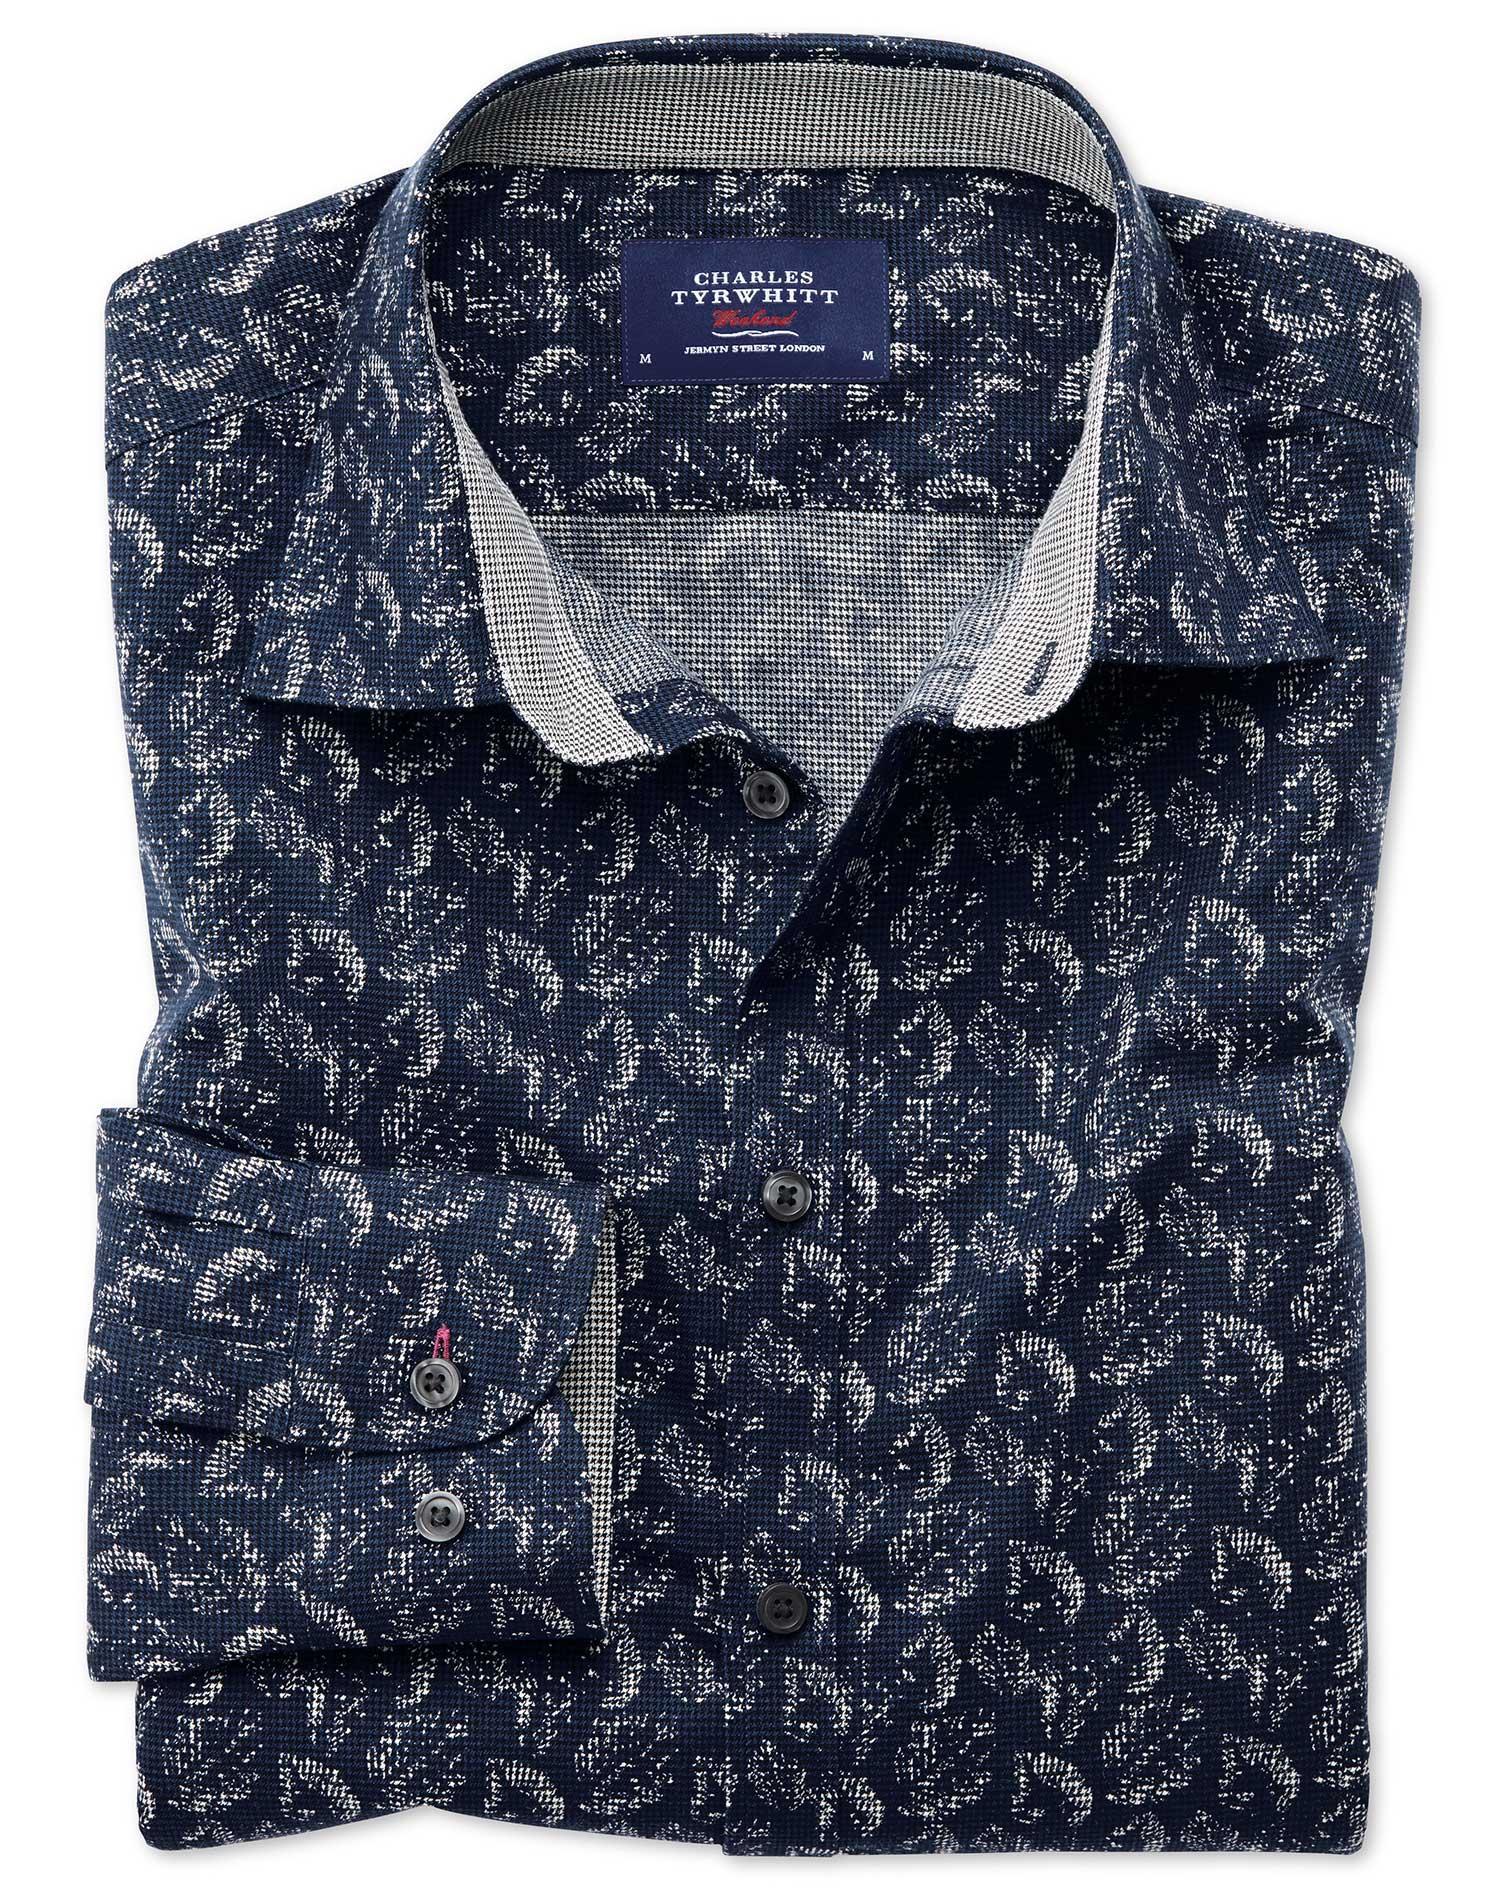 Extra Slim Fit Dark Blue Leaf Print Cotton Shirt Single Cuff Size XXL by Charles Tyrwhitt